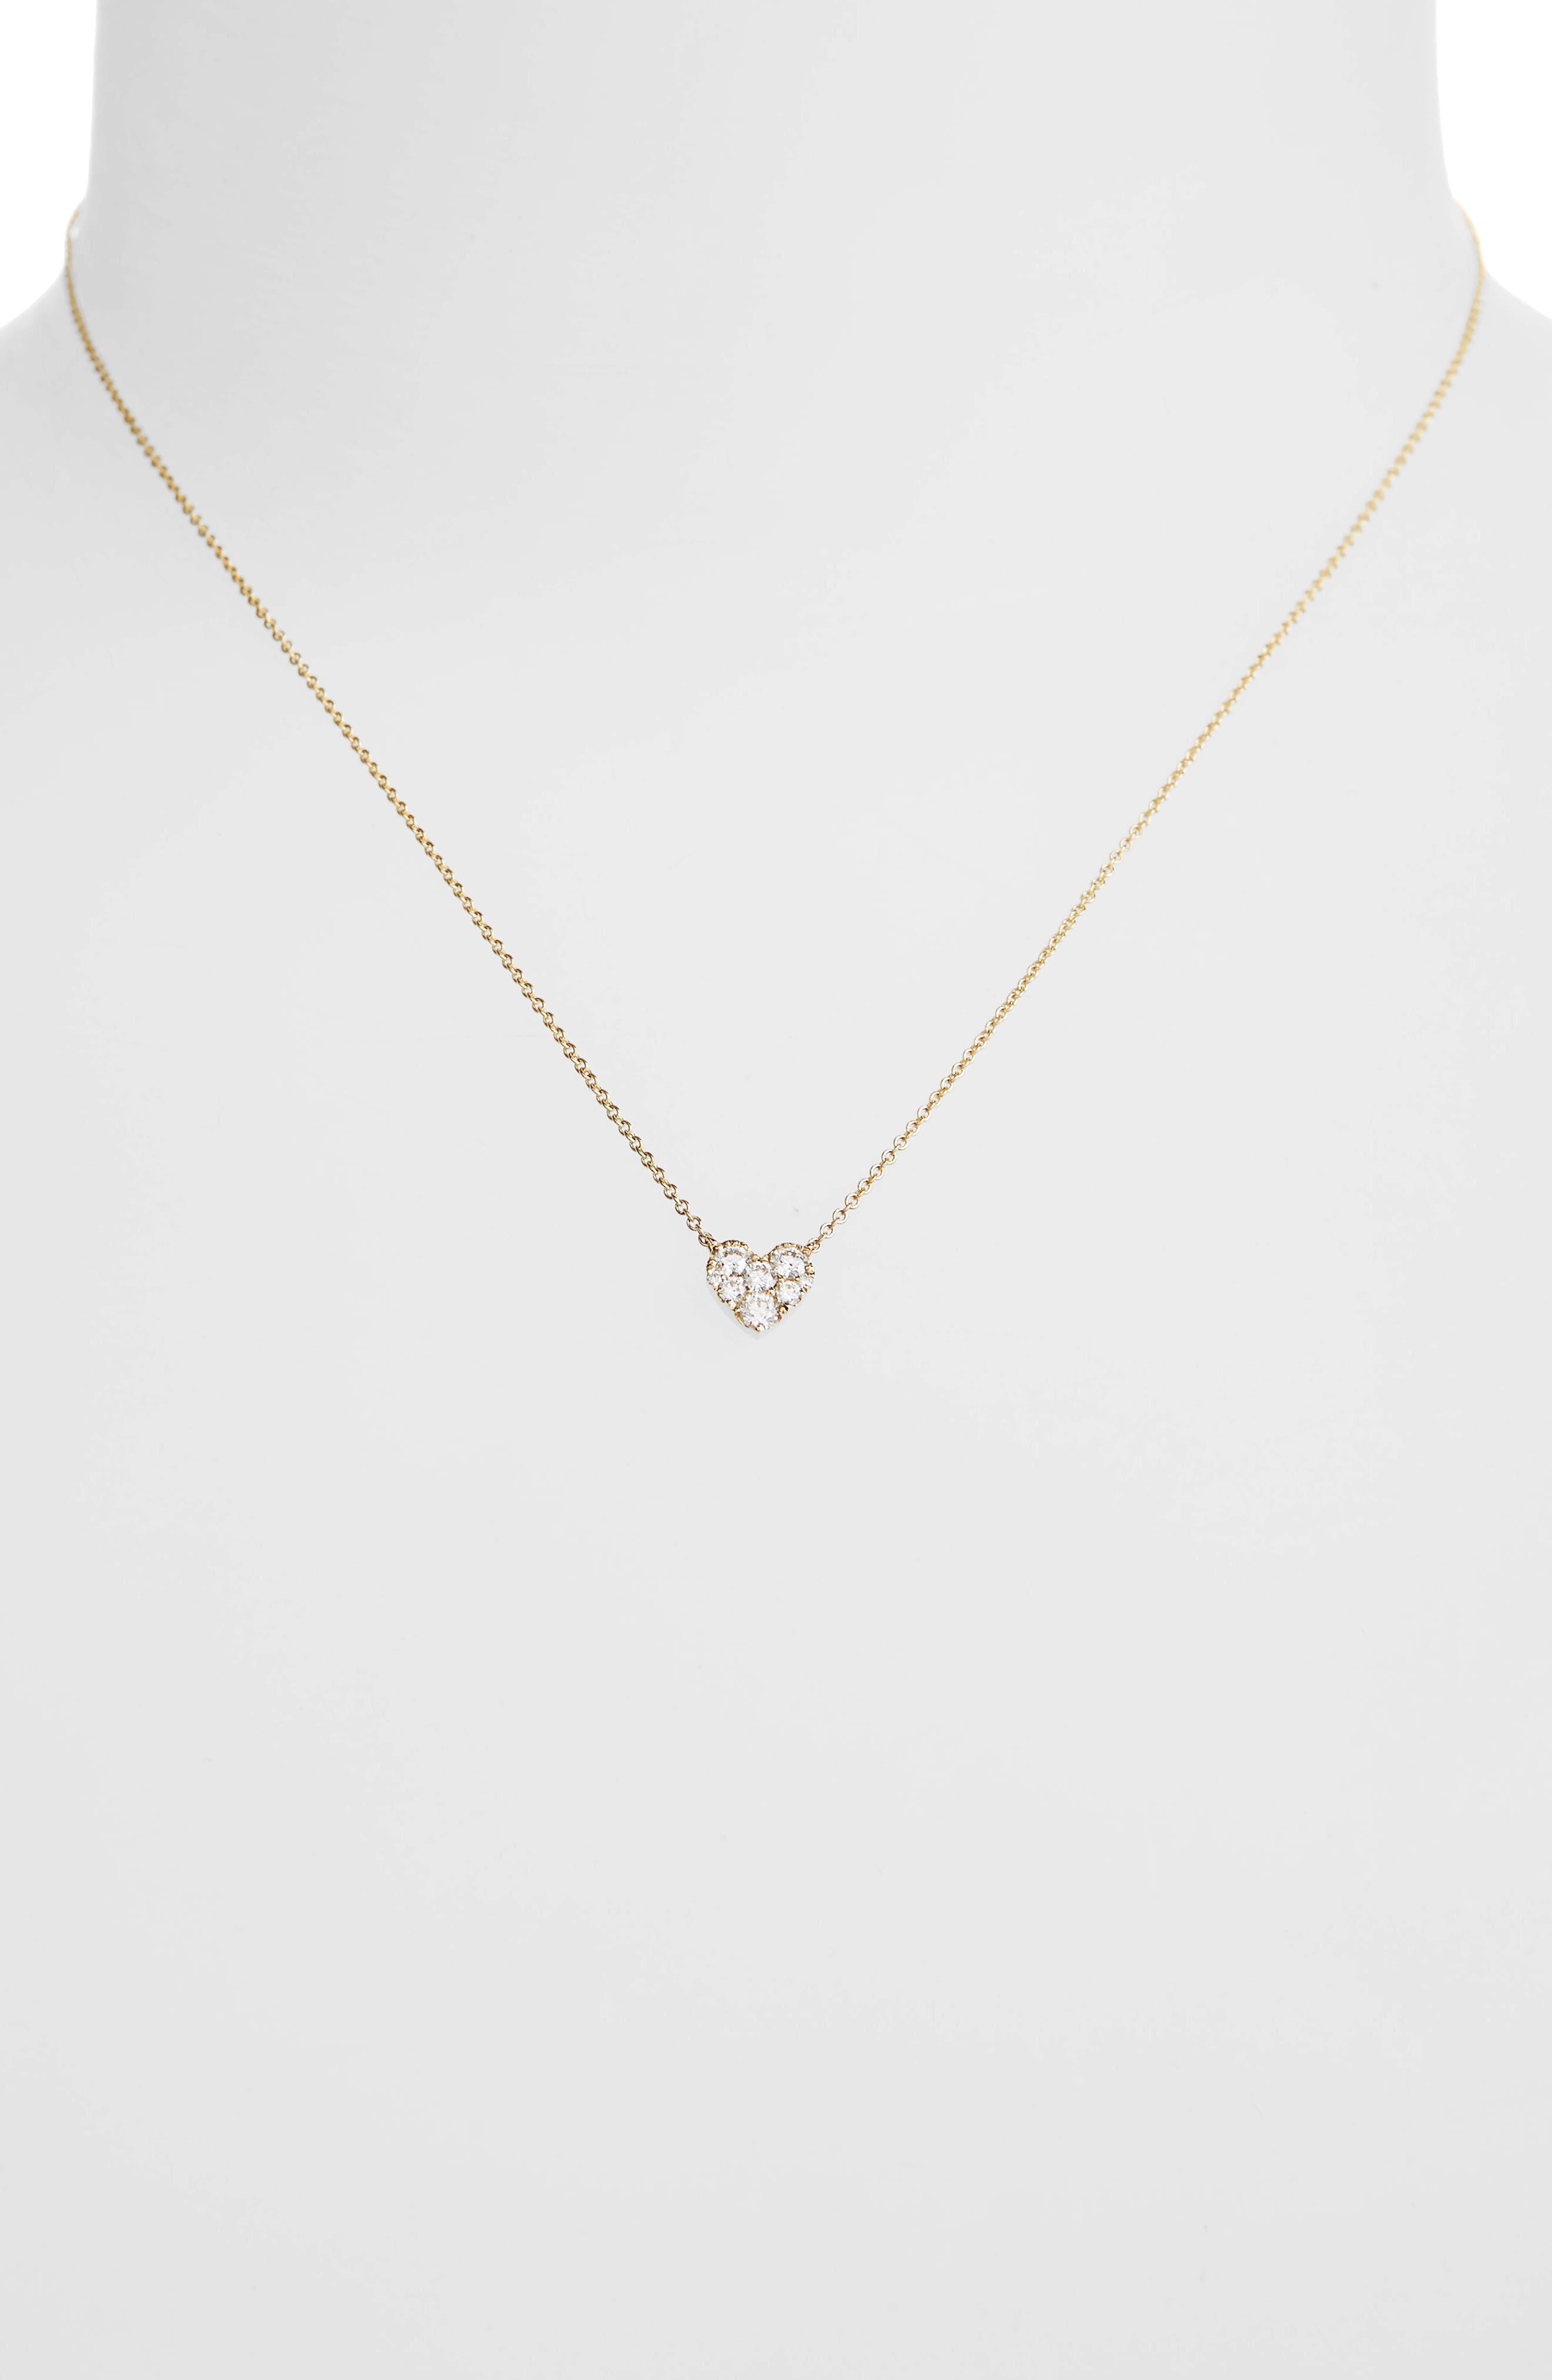 Heart Diamond Pendant Necklace,                             Alternate thumbnail 2, color,                             Yellow Gold